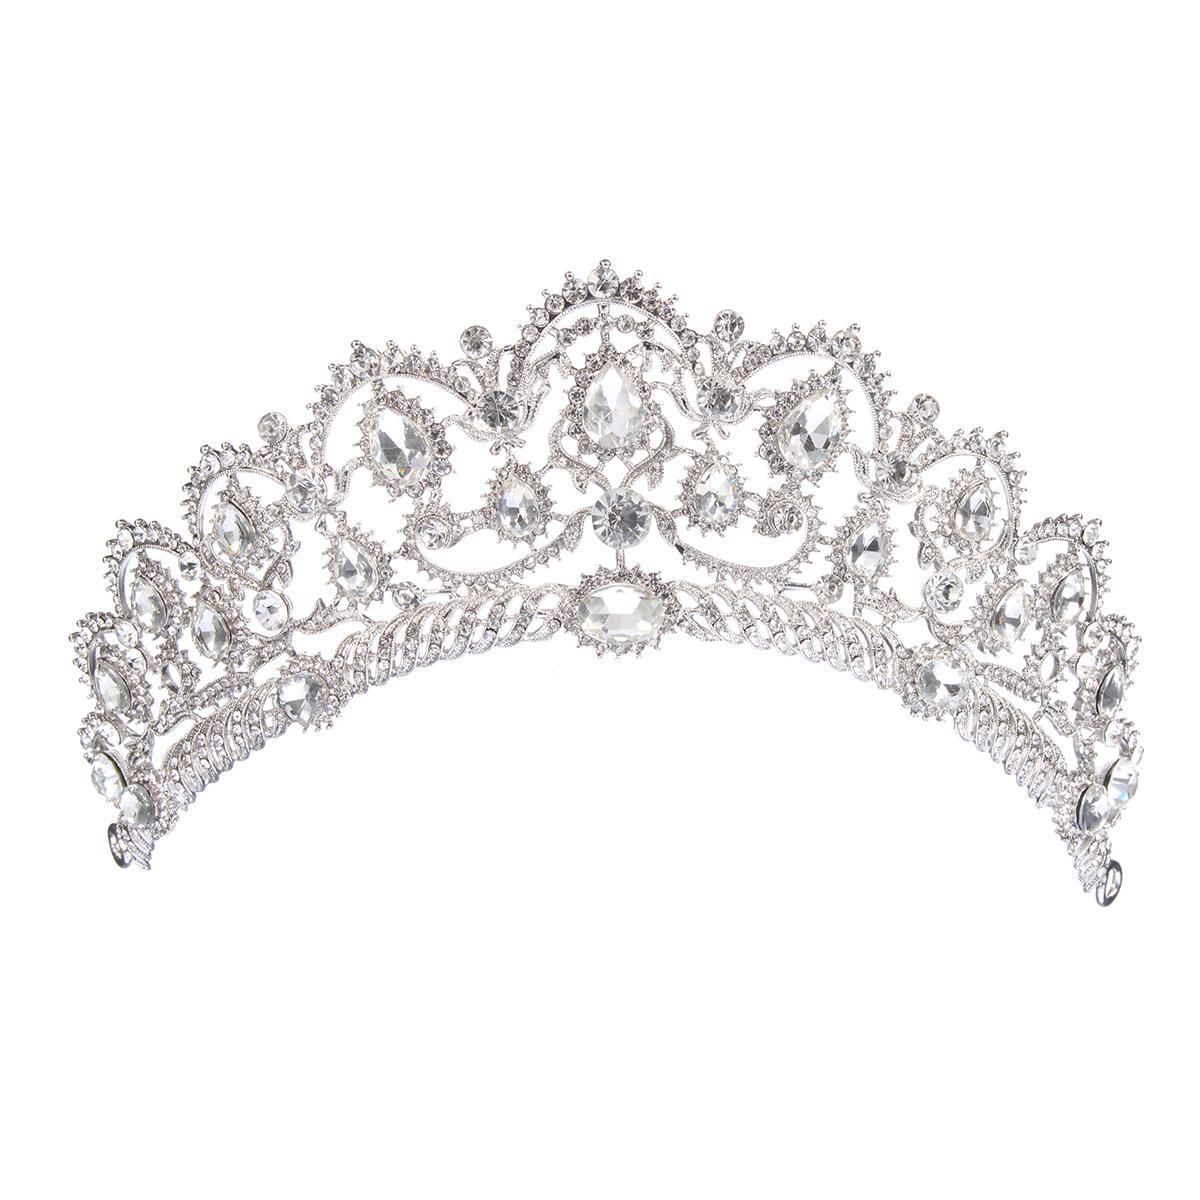 Bride Rhinestone Crystal Princess Queen Crown Tiara Head Jewelry Headpiece Wedding Party Headbrand